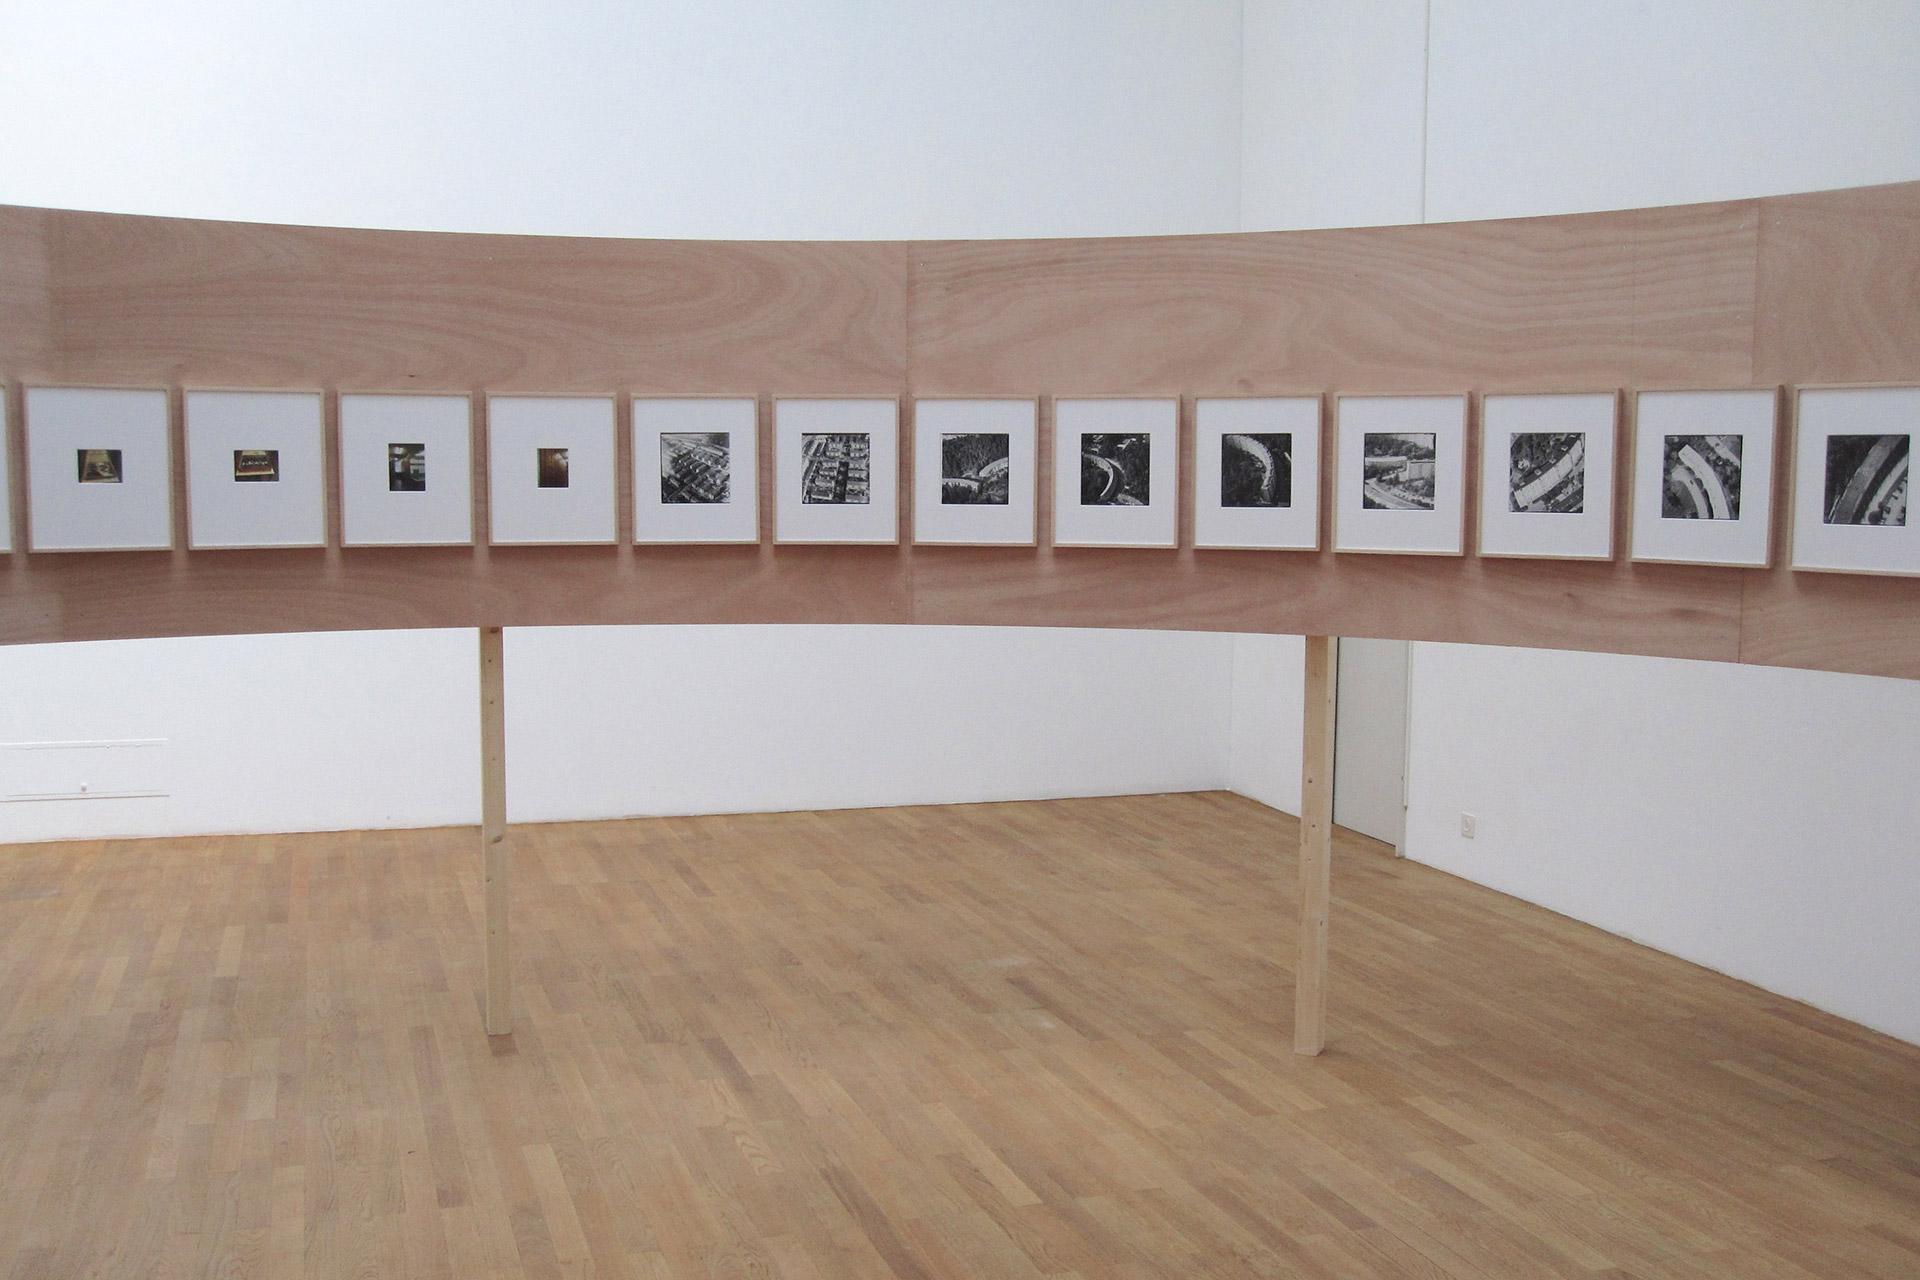 Susanne-Kriemann-Kunsthalle-Winterthur-2011-3.jpg